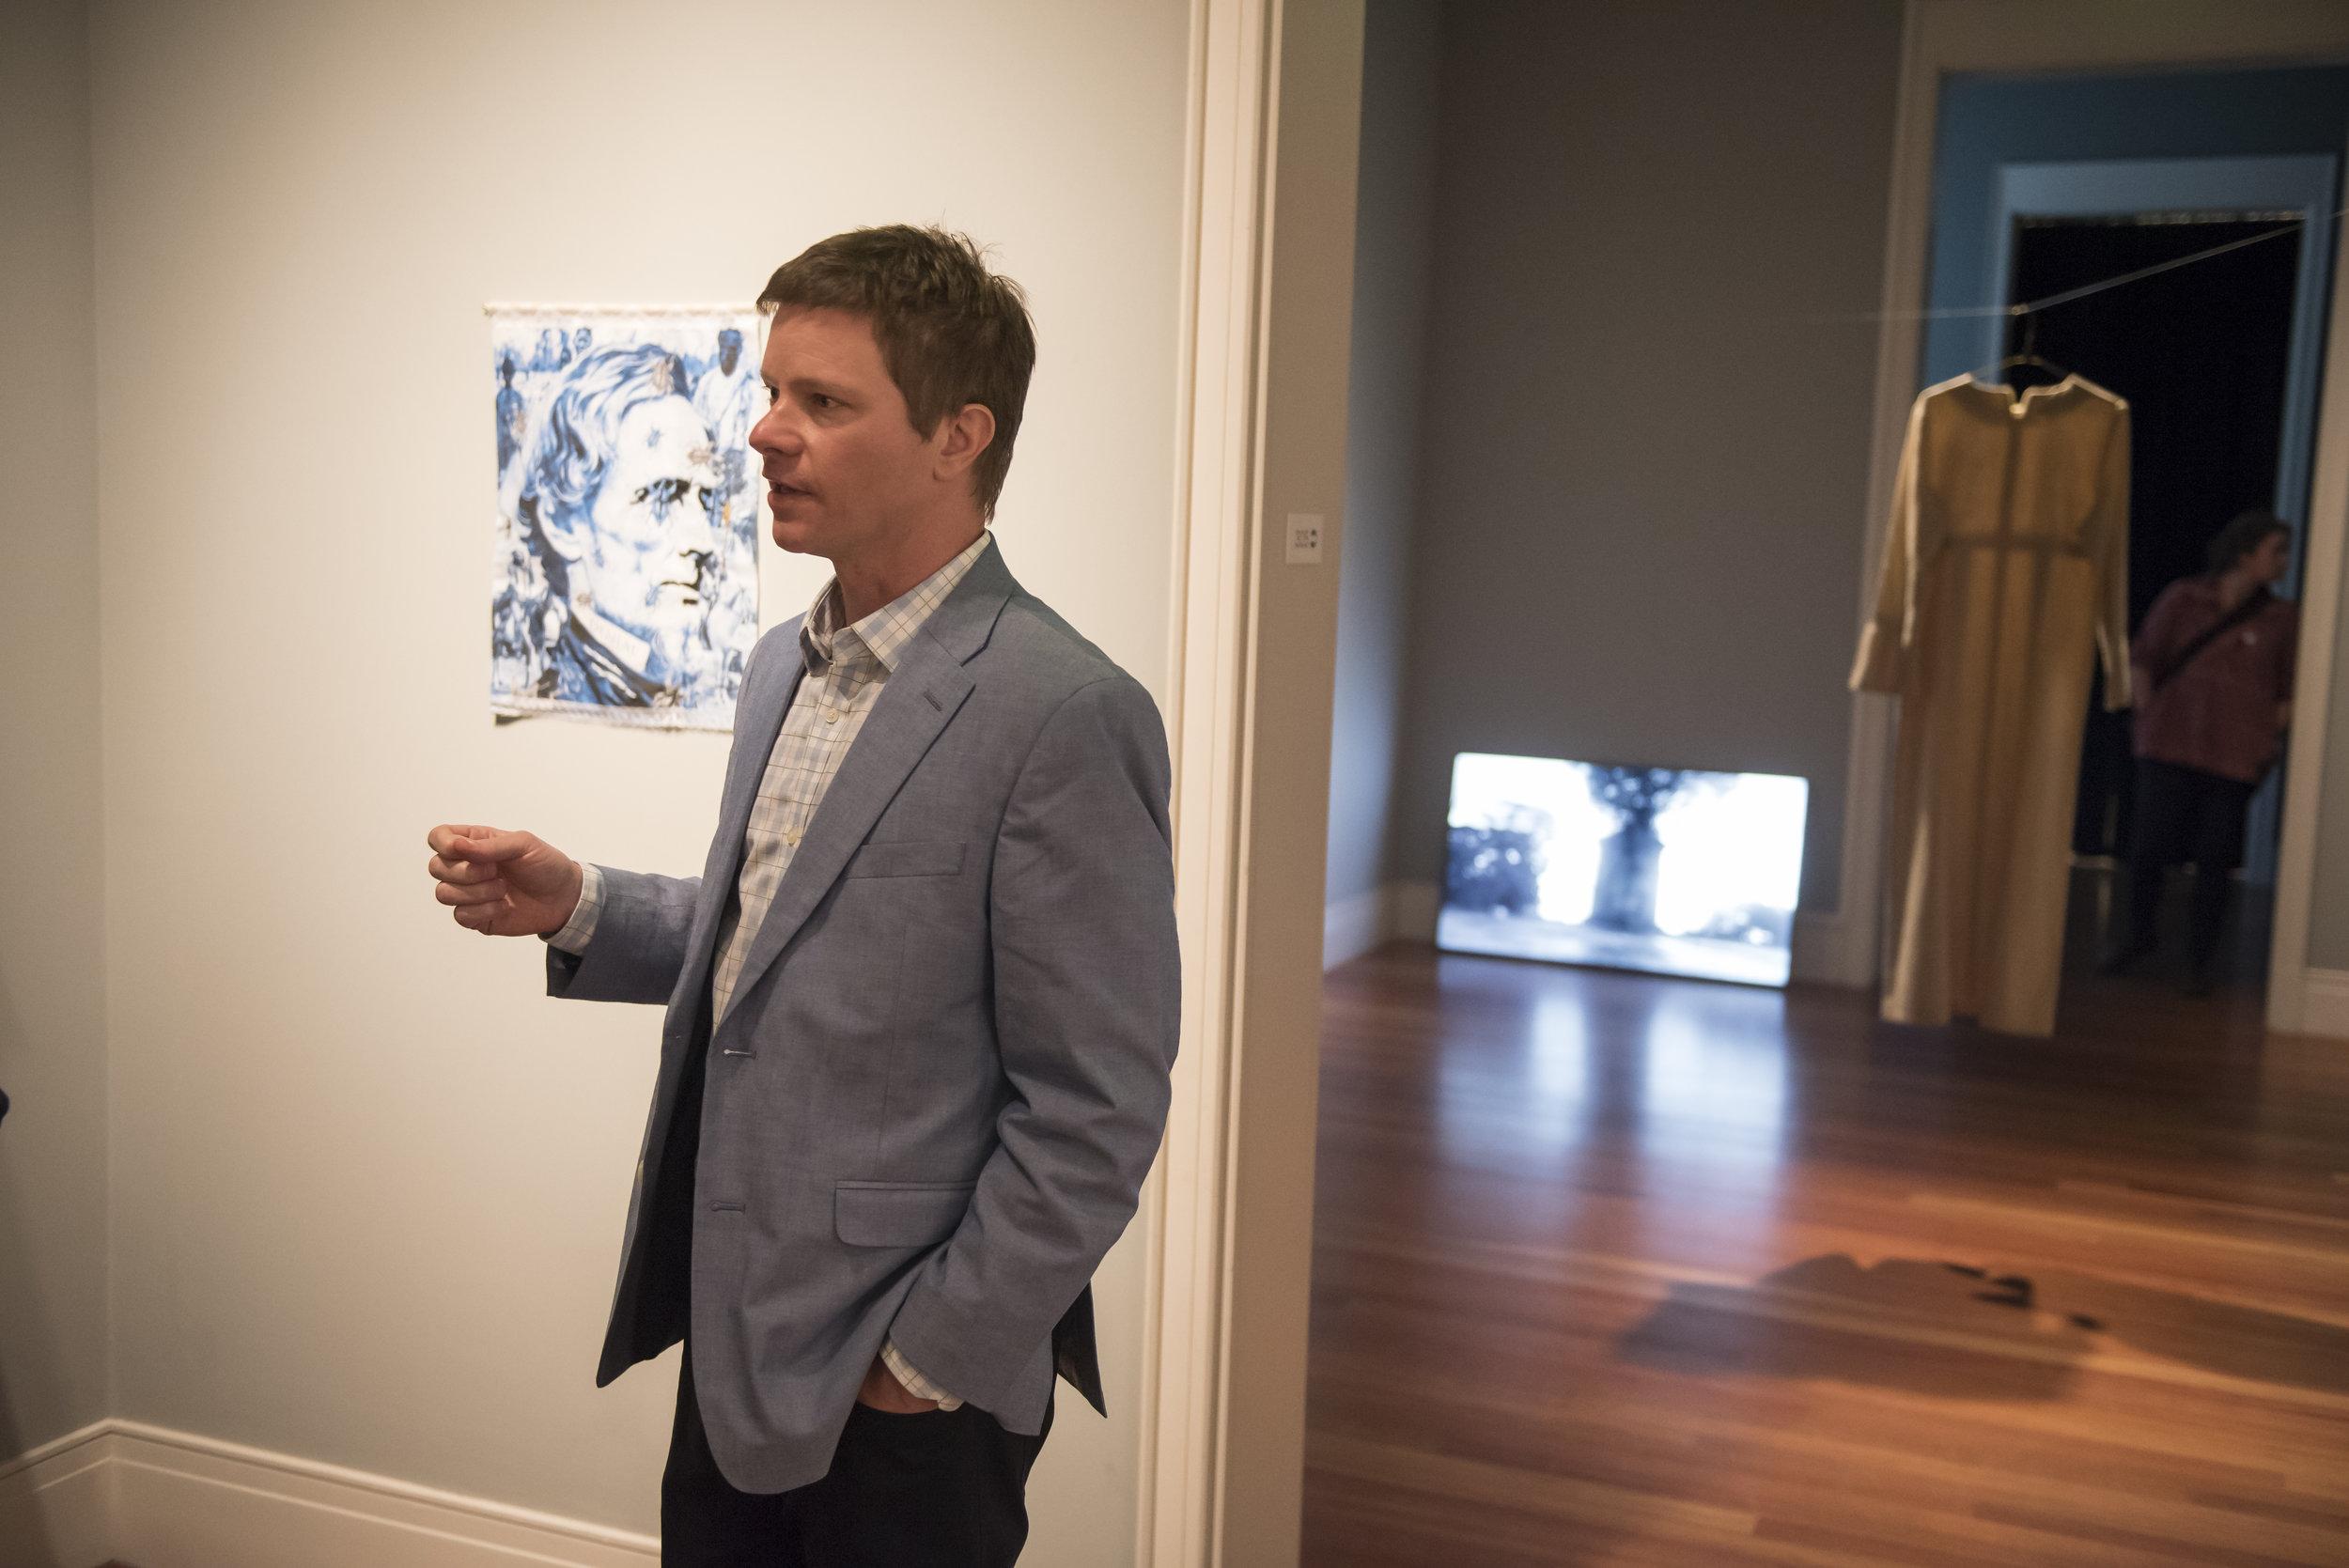 P.4 Artistic Director, Trevor Schoonmaker, Giving Tour at Ogden Museum of Southern Art